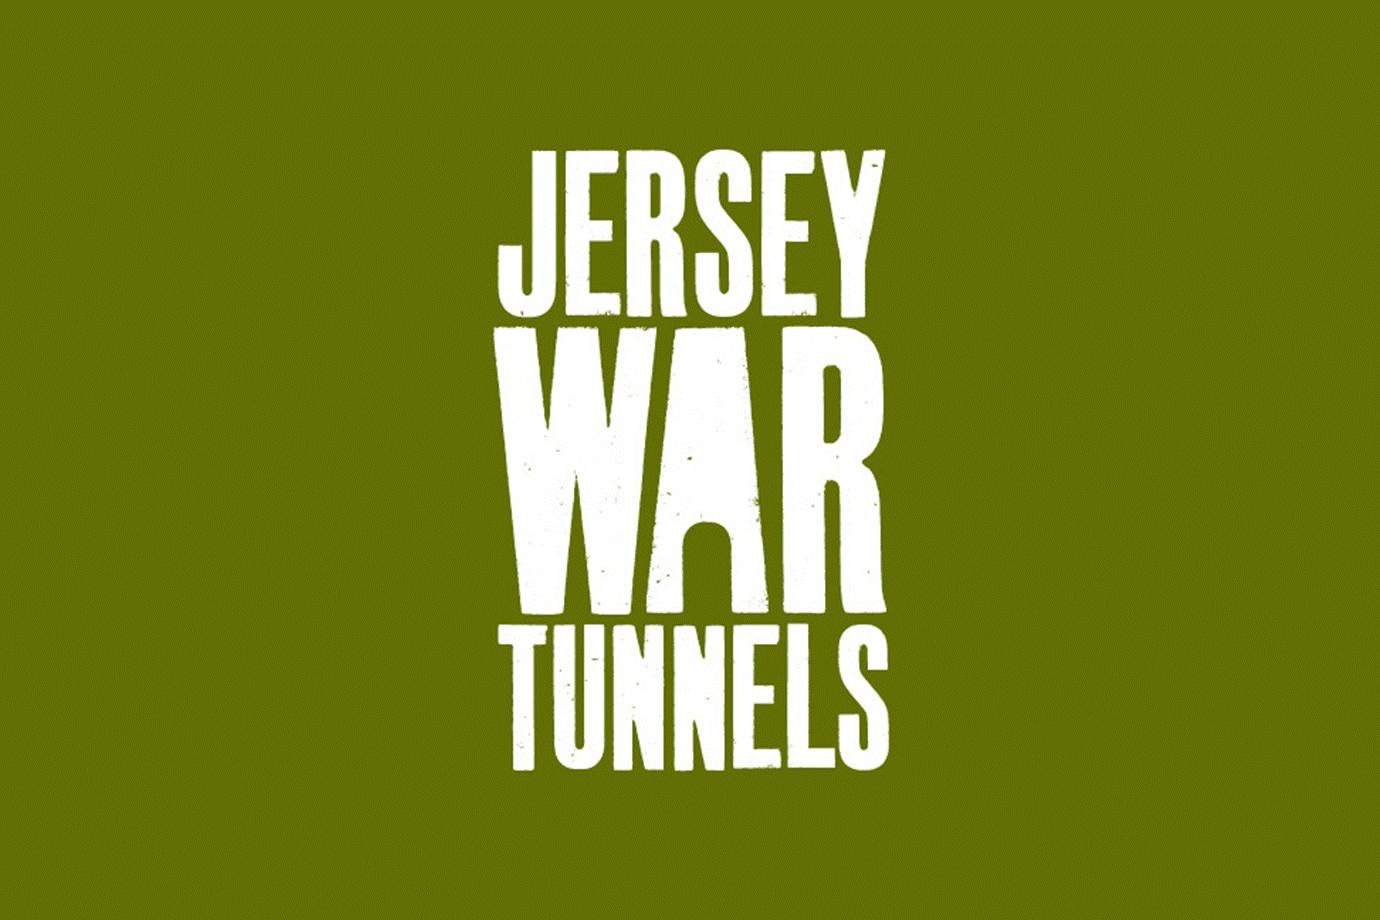 Jersey War Tunnels Limited